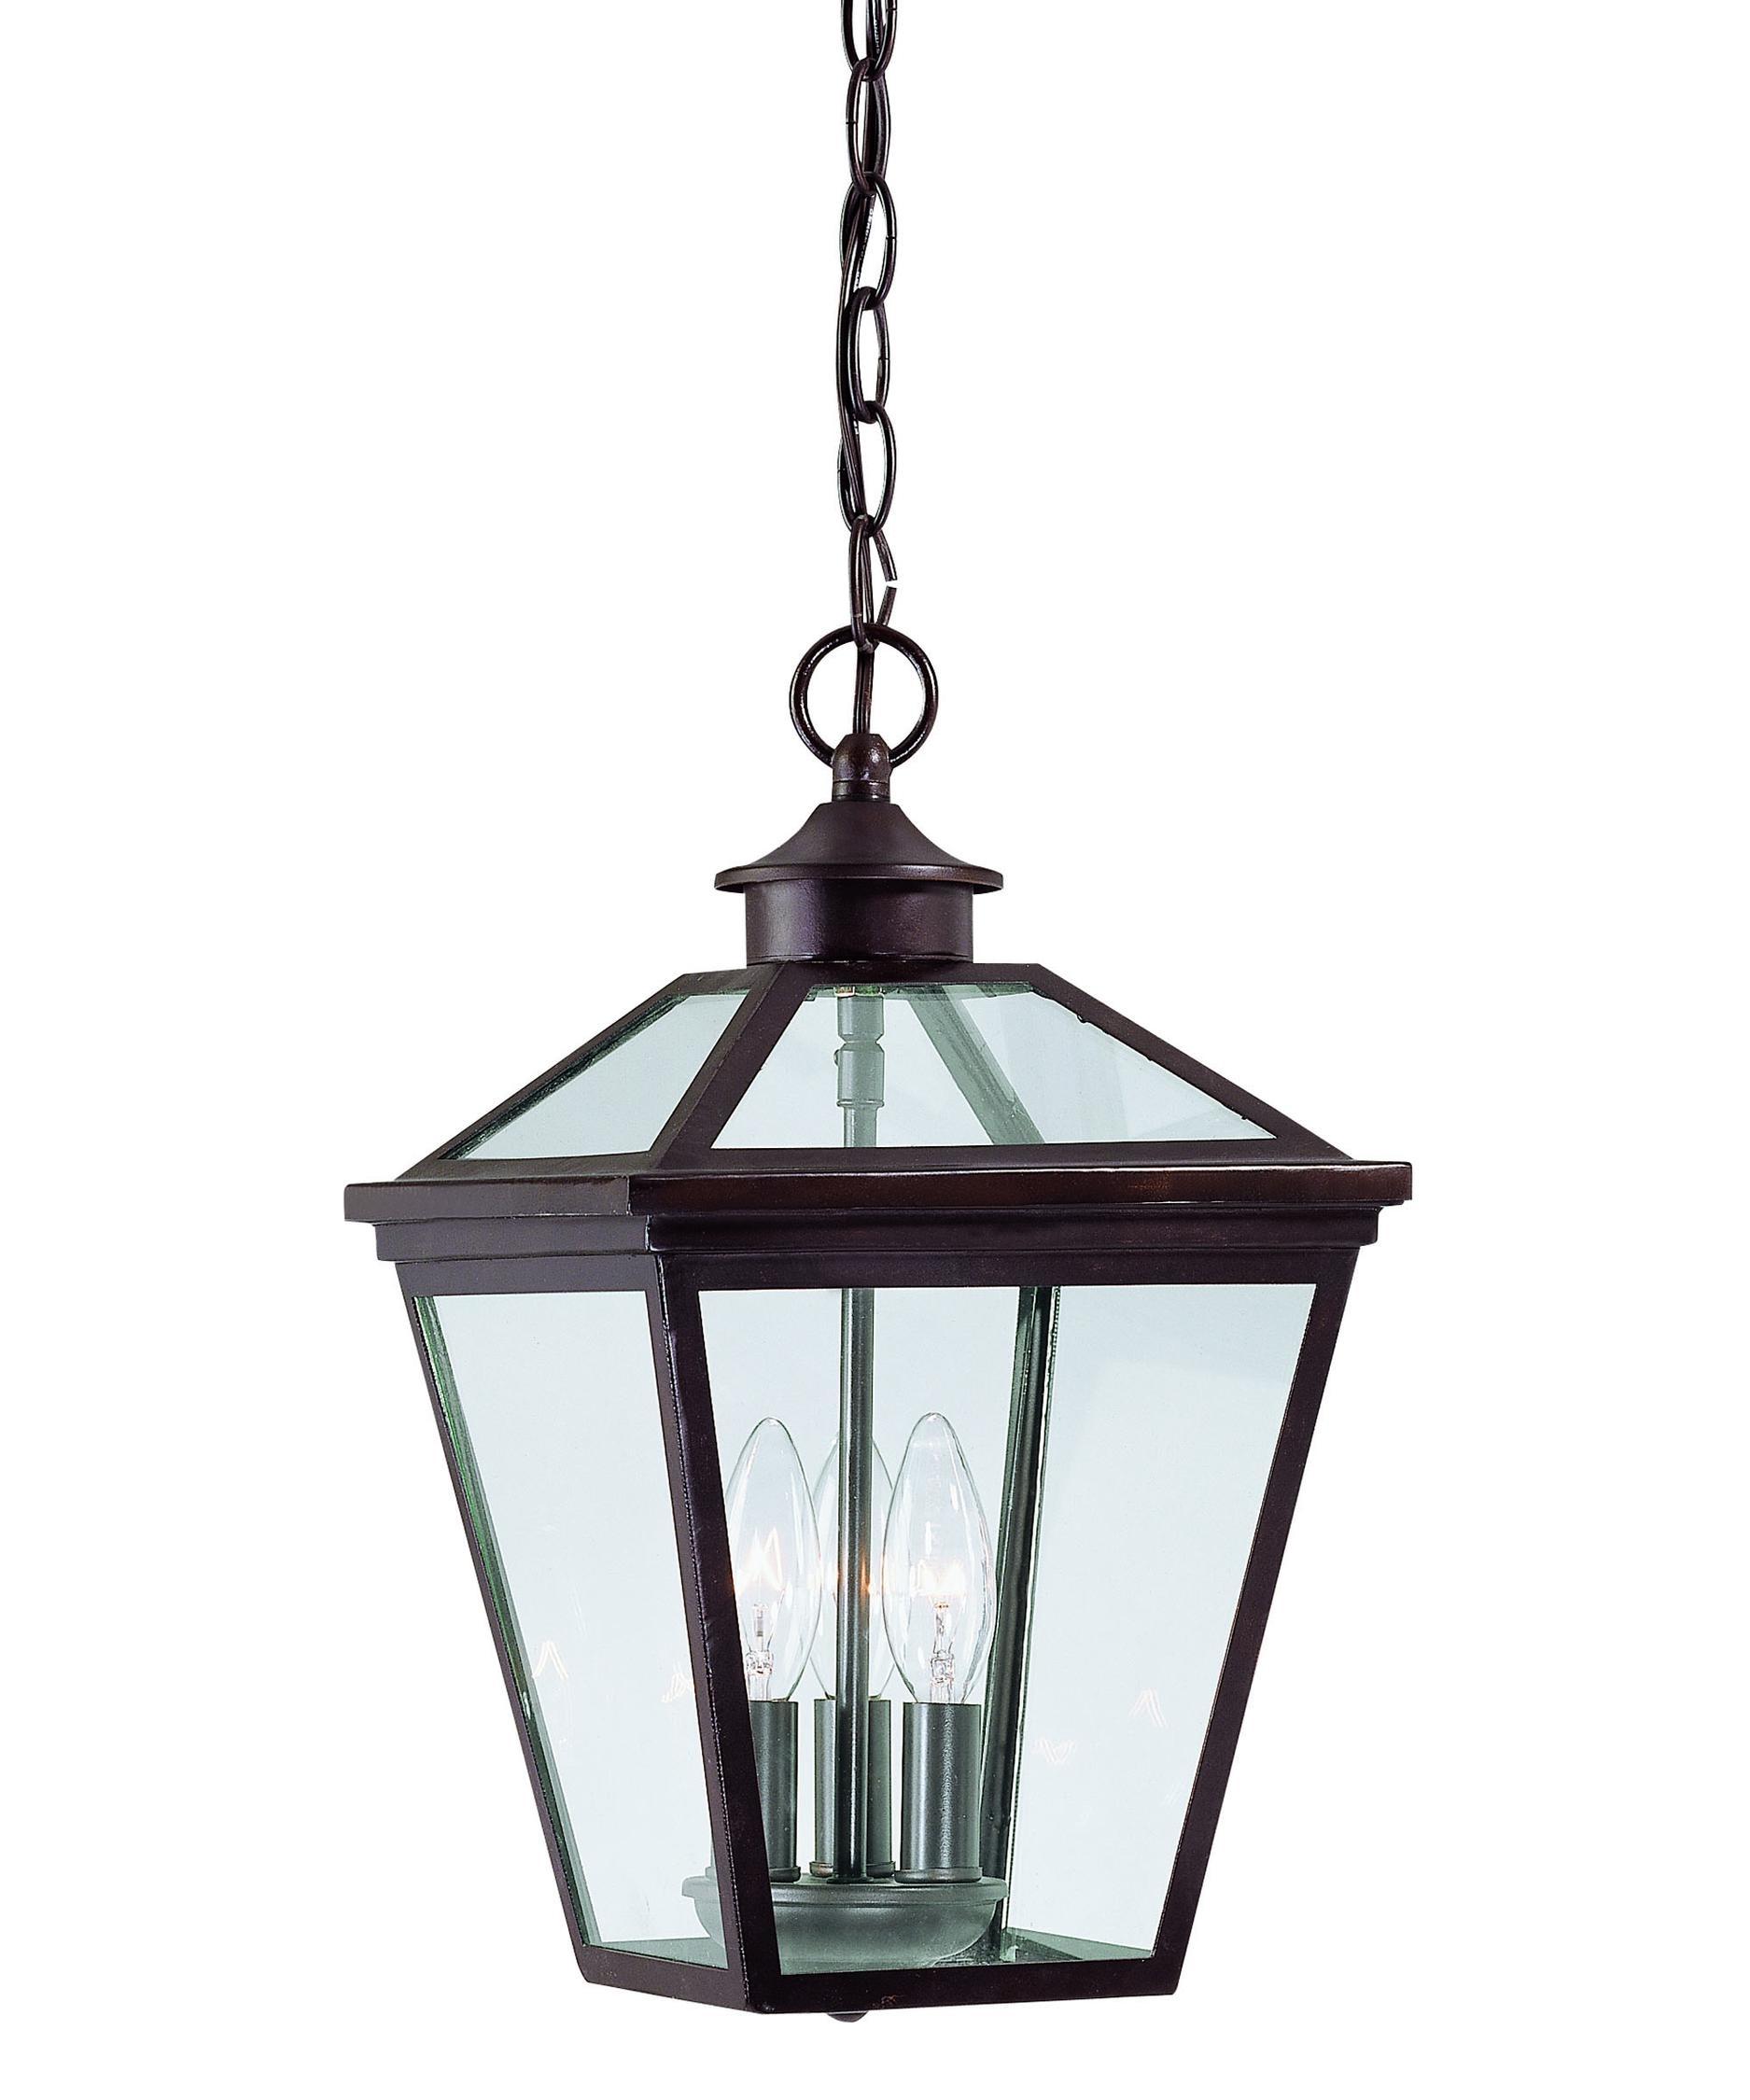 Outdoor Hanging Light Fixtures Home Depot – Outdoor Designs Throughout Outdoor Hanging Lighting Fixtures At Home Depot (#10 of 15)